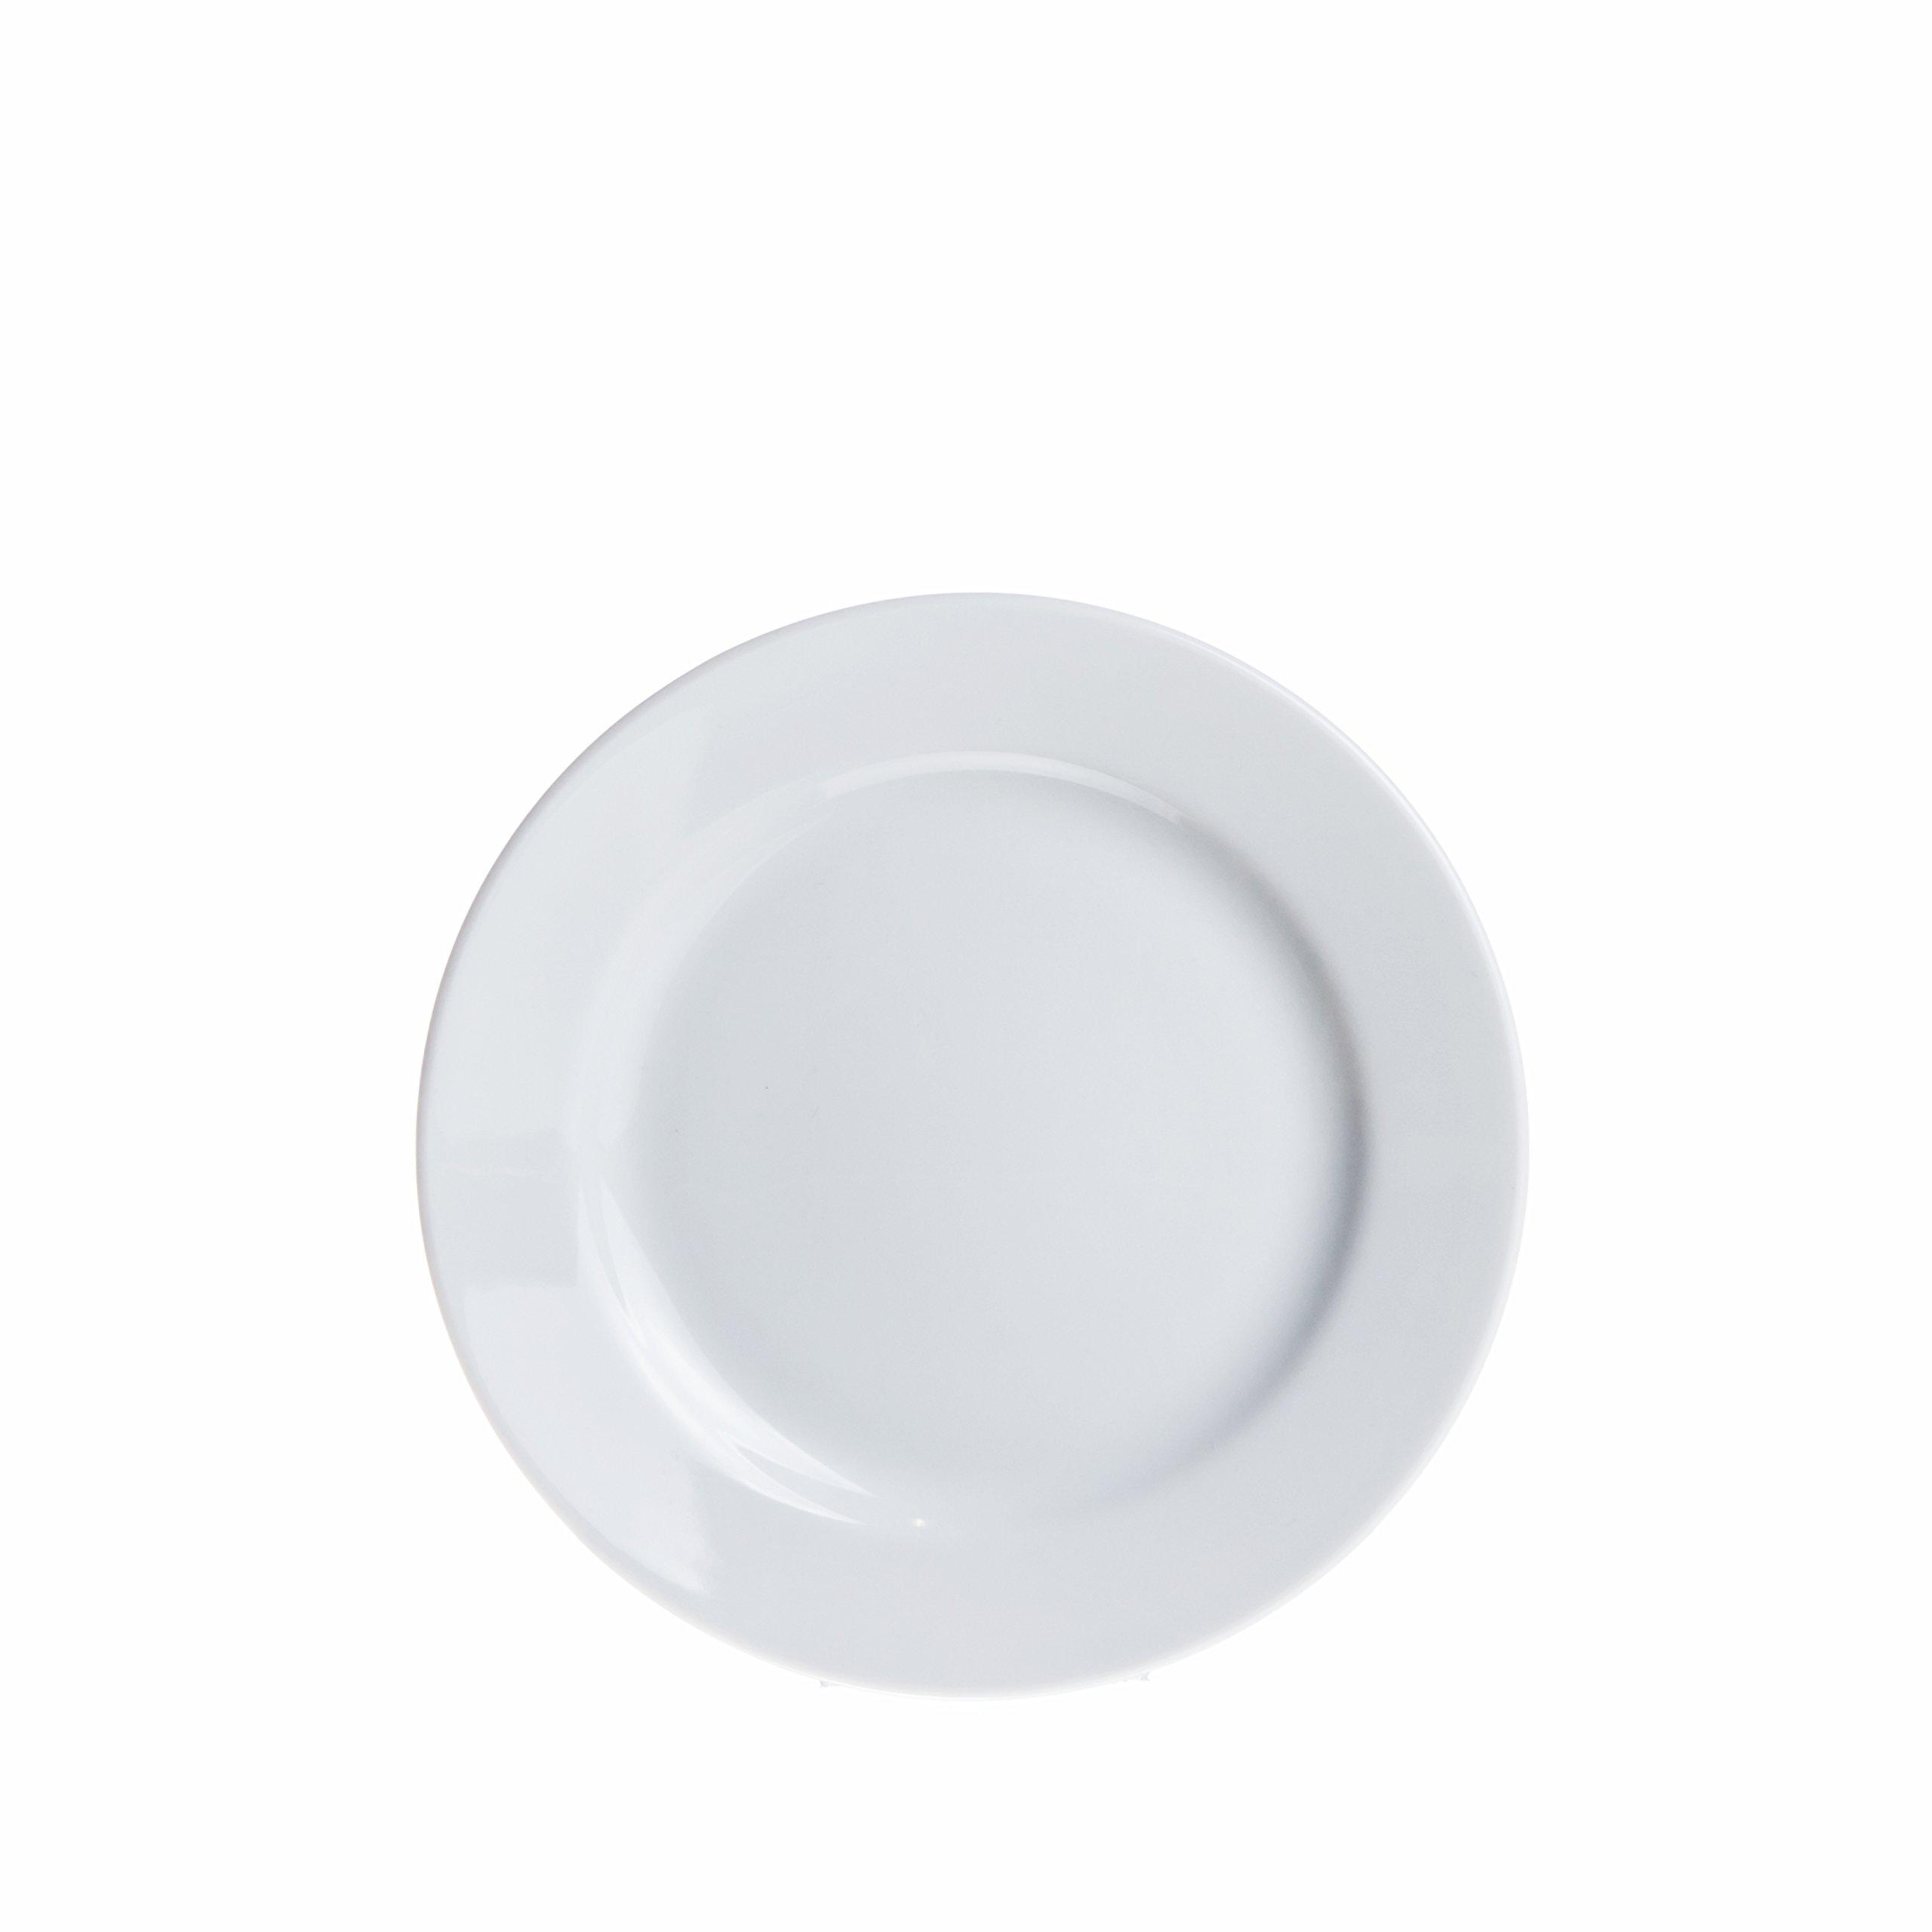 12-Piece Bread/Dessert/Dinner Plates Set, Durable White Porcelain, Restaurant&Hotel Quality, 6.6''